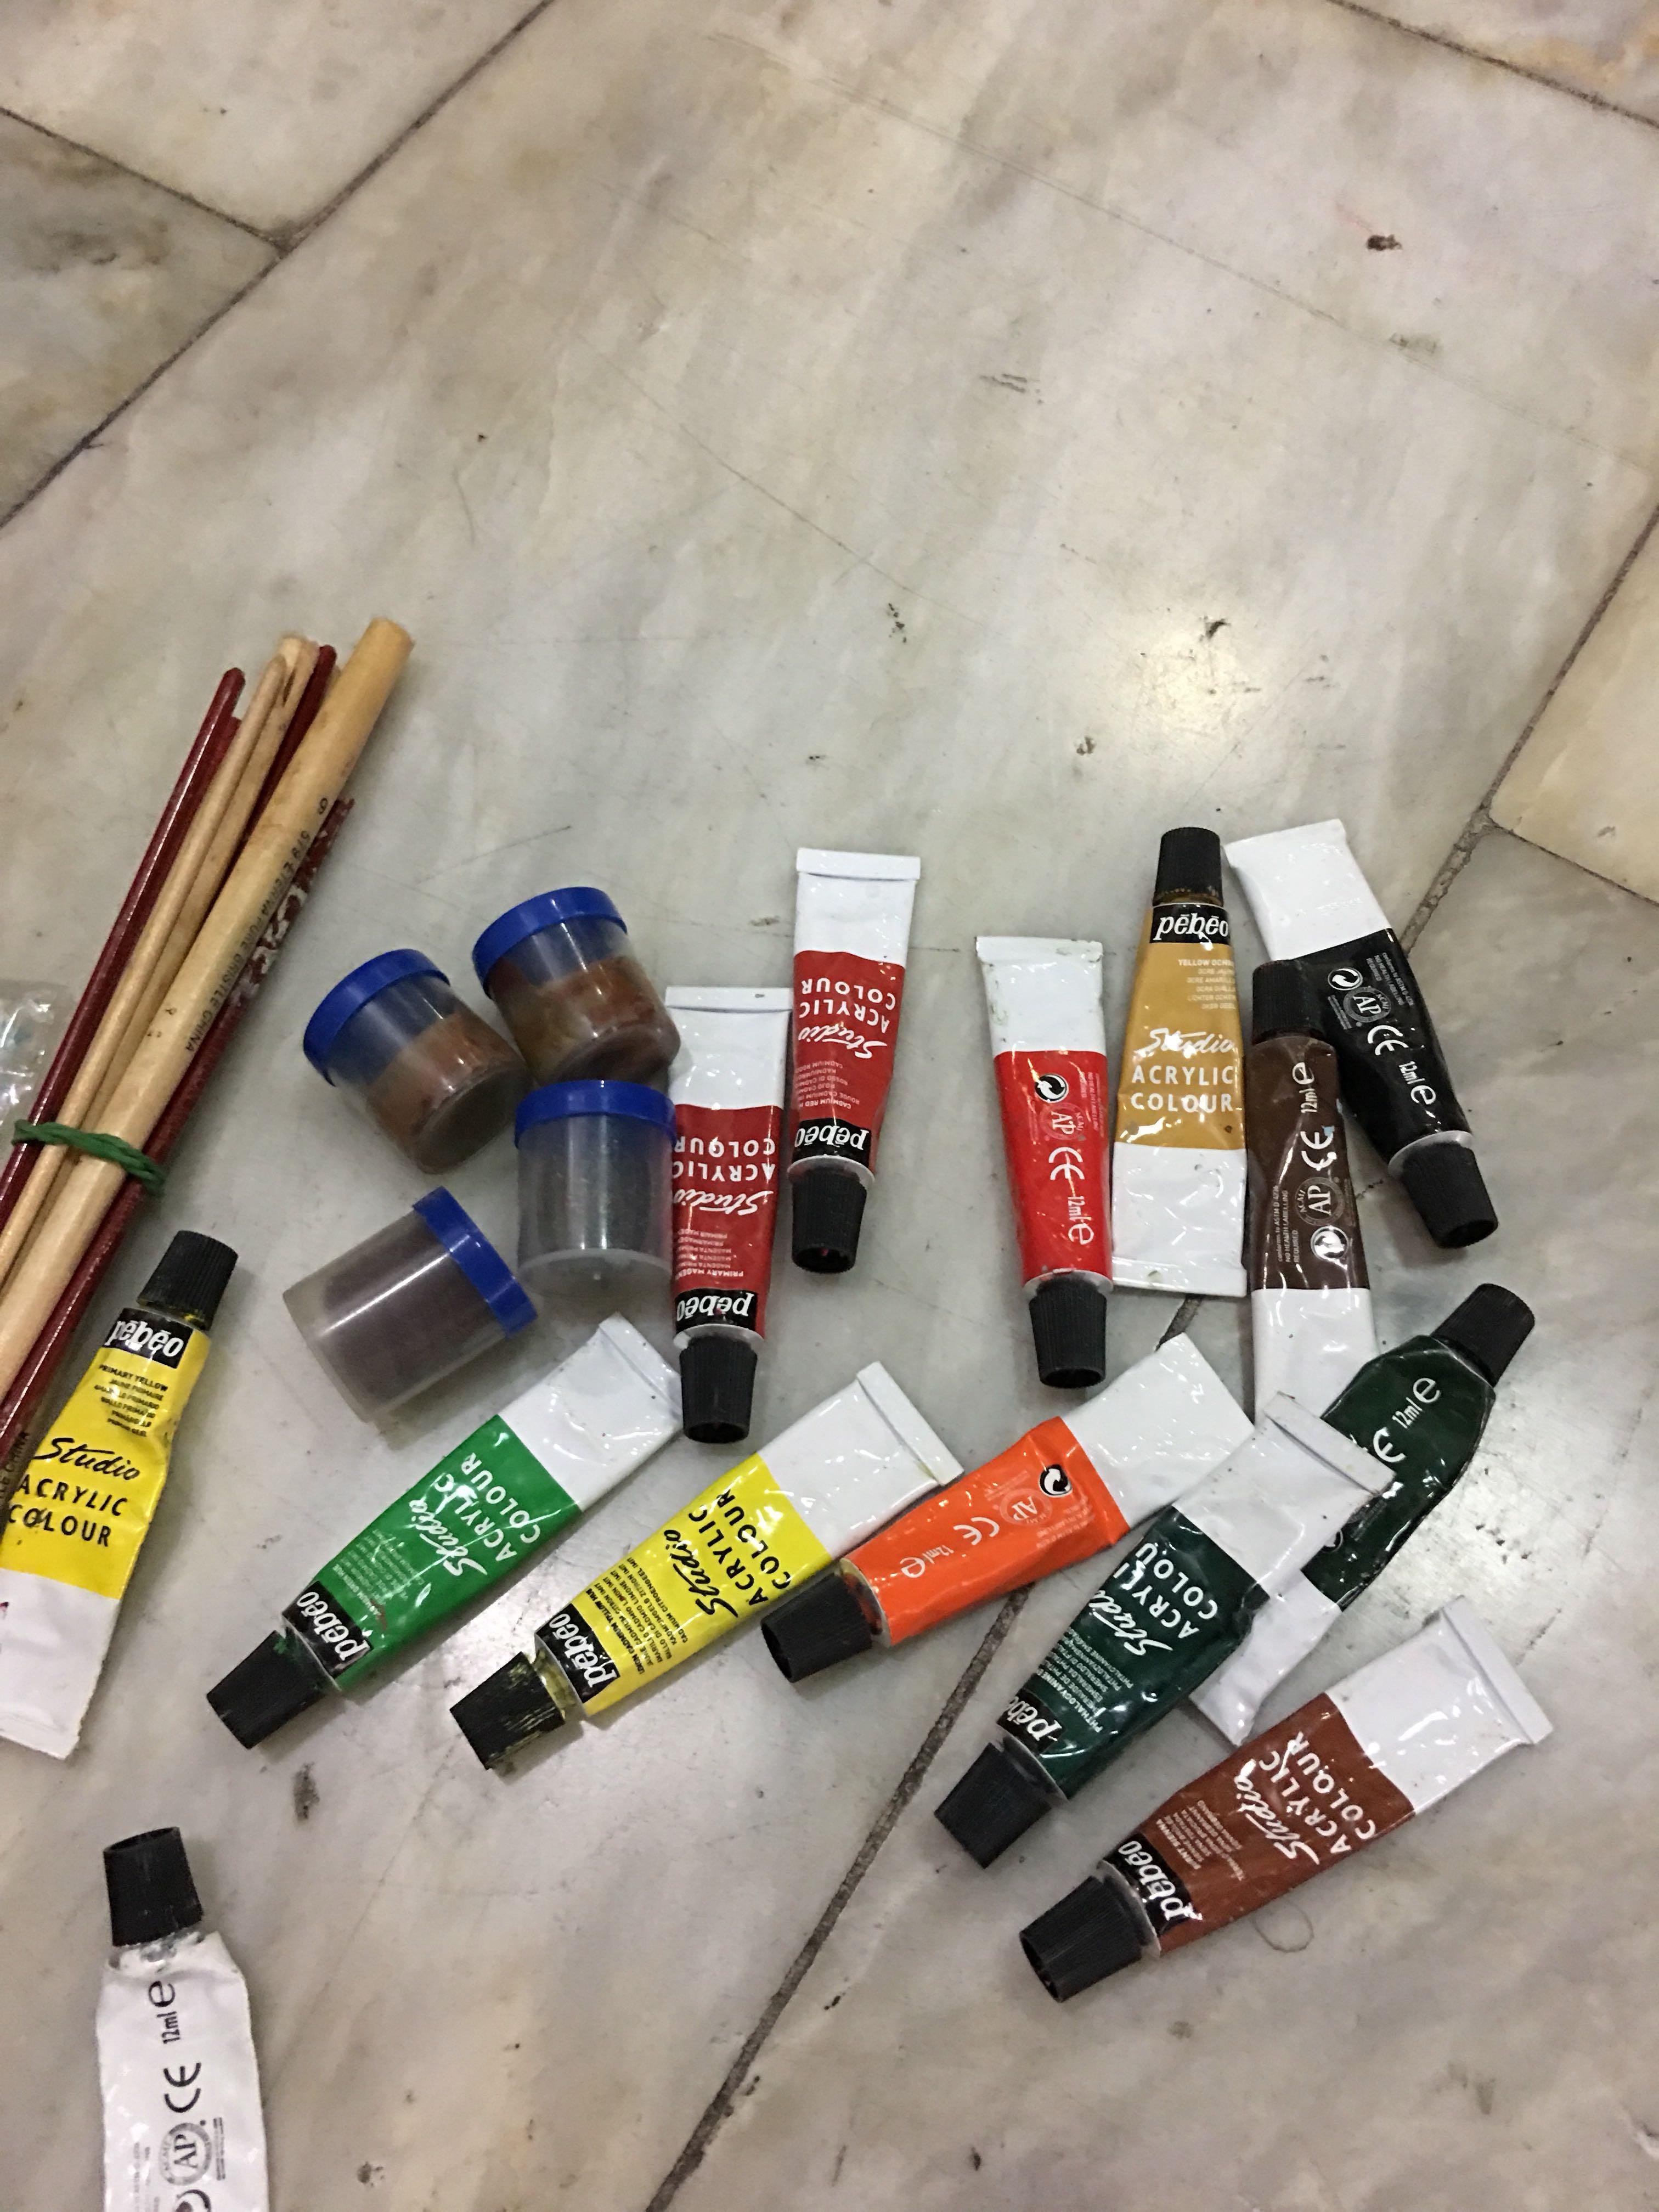 Giveaway: Assorted Art stuff